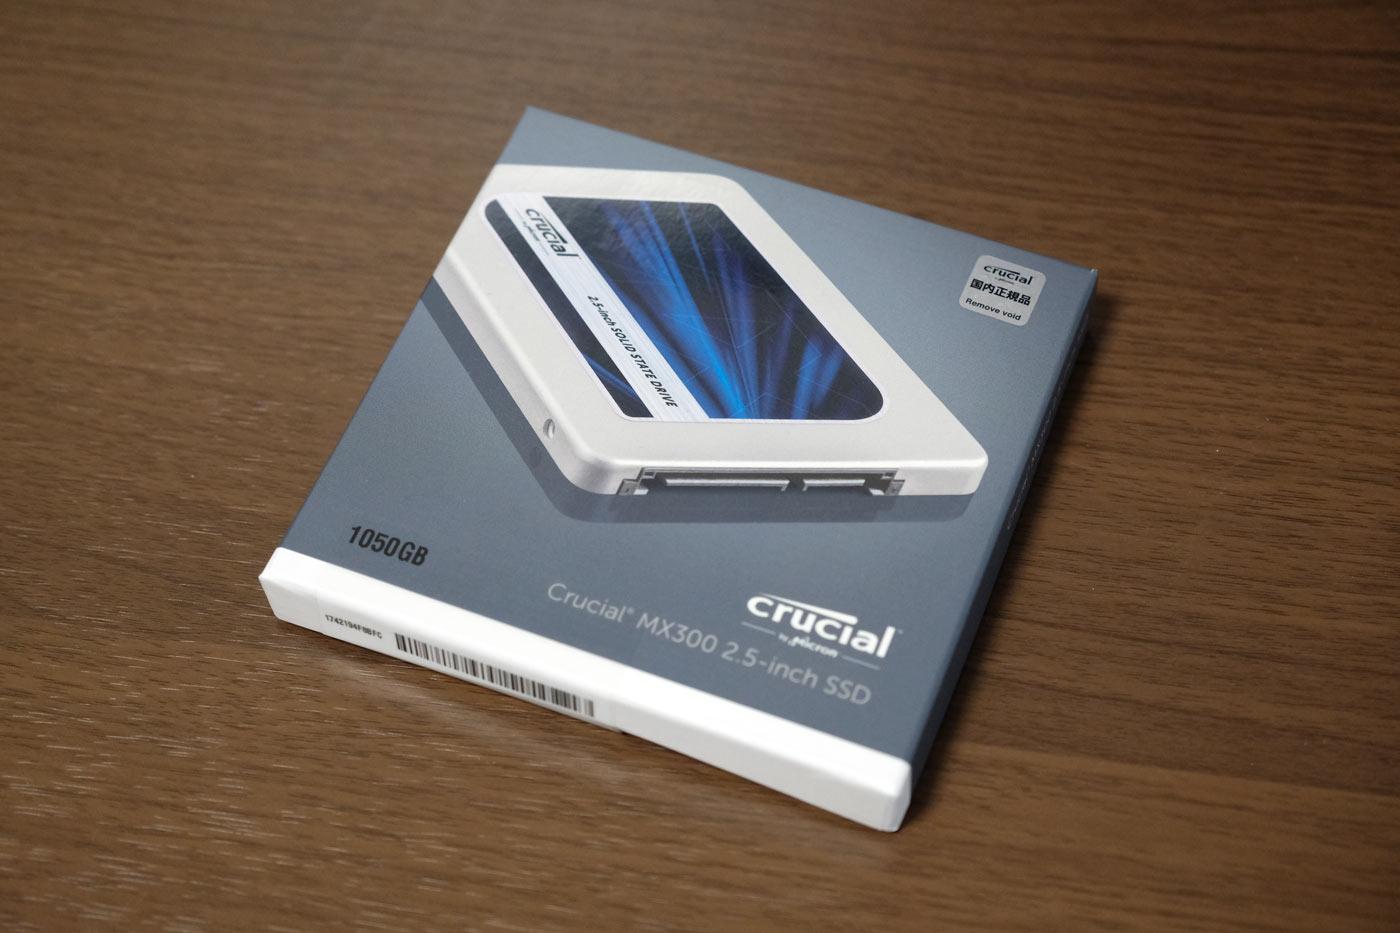 SSD Crucial [Micron製] MX300 1TB